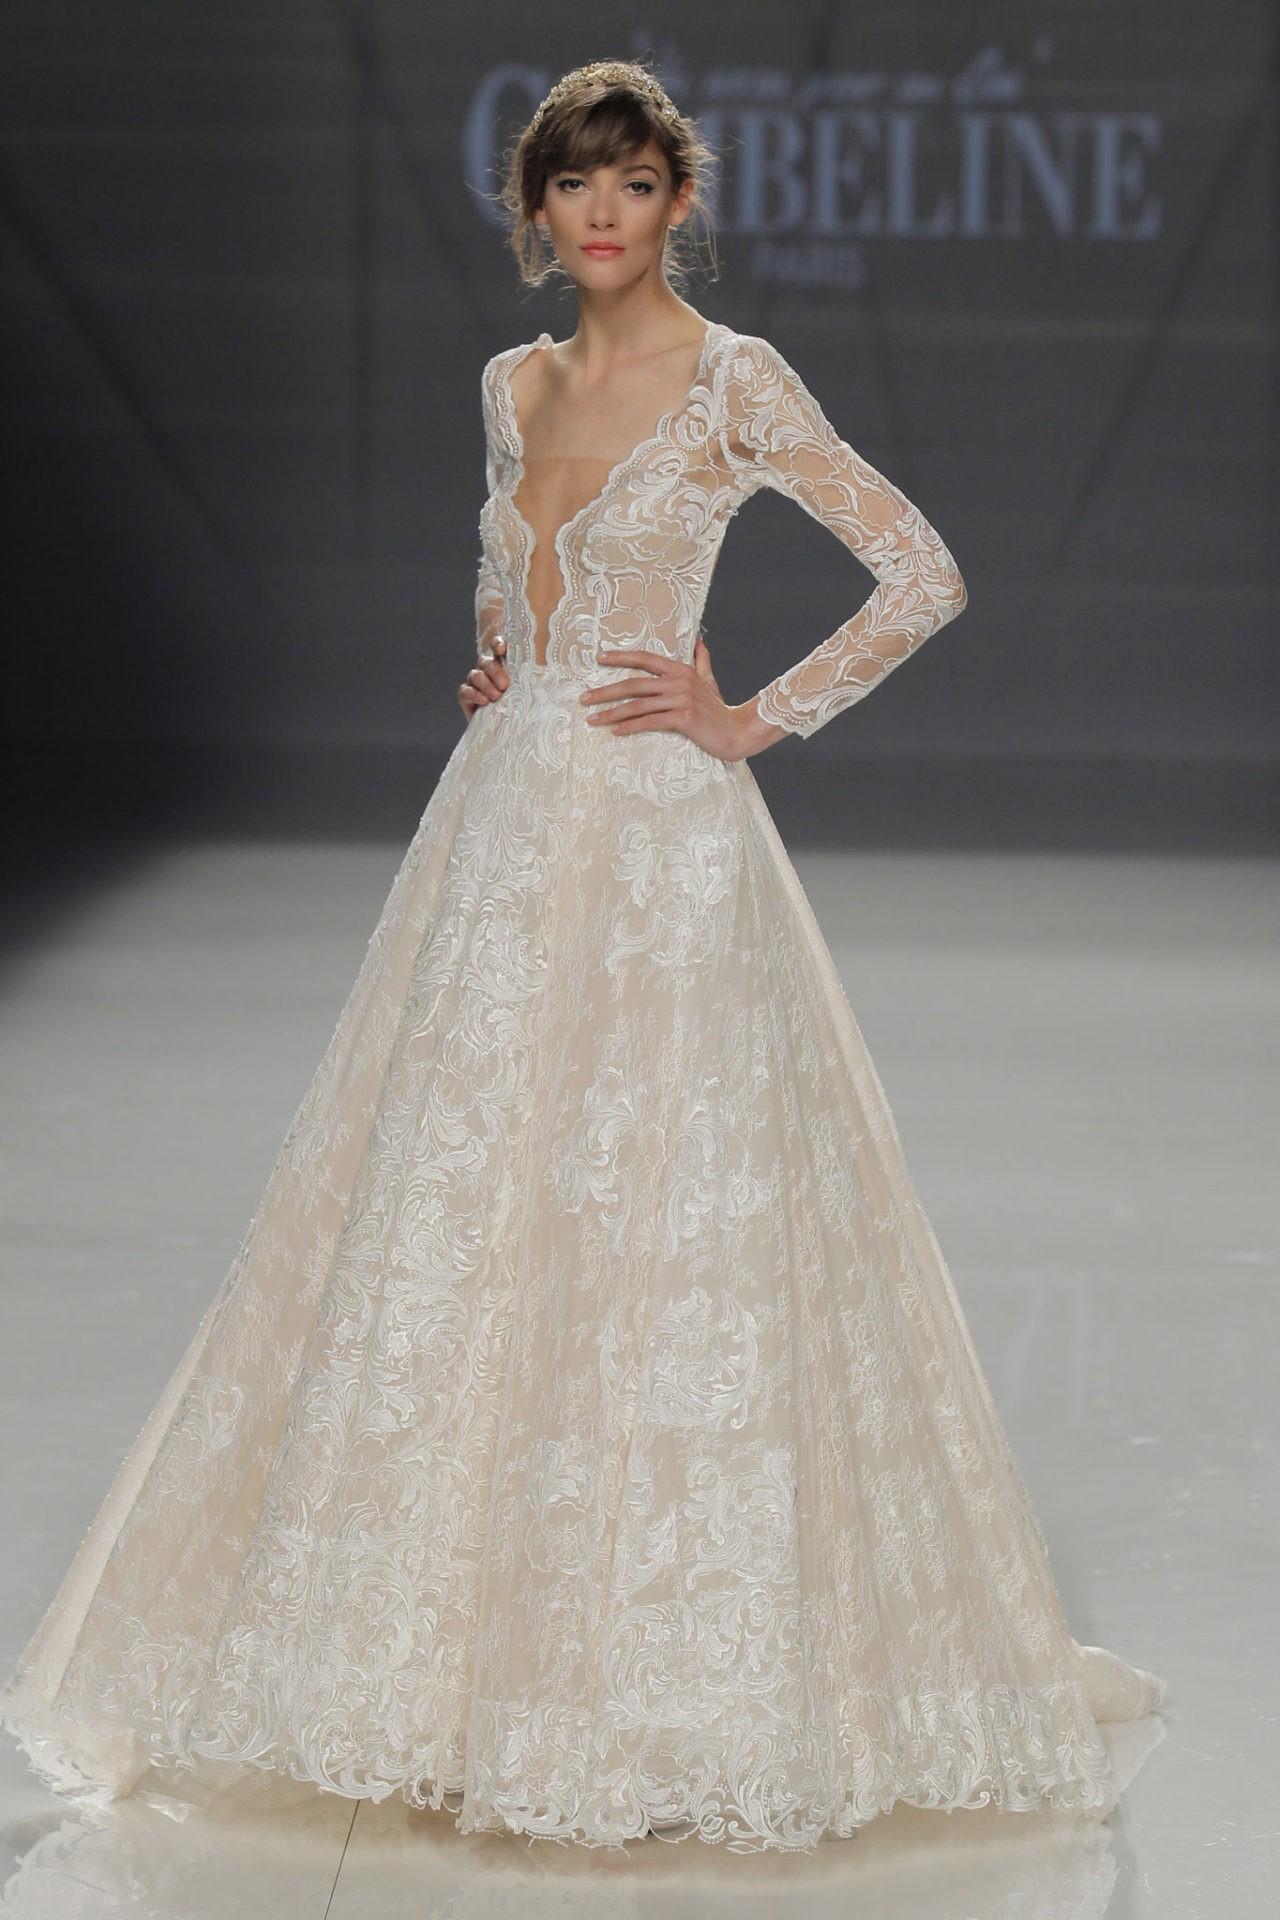 CHRISTIANA - Robe de mariée - Cymbeline Collection 2018